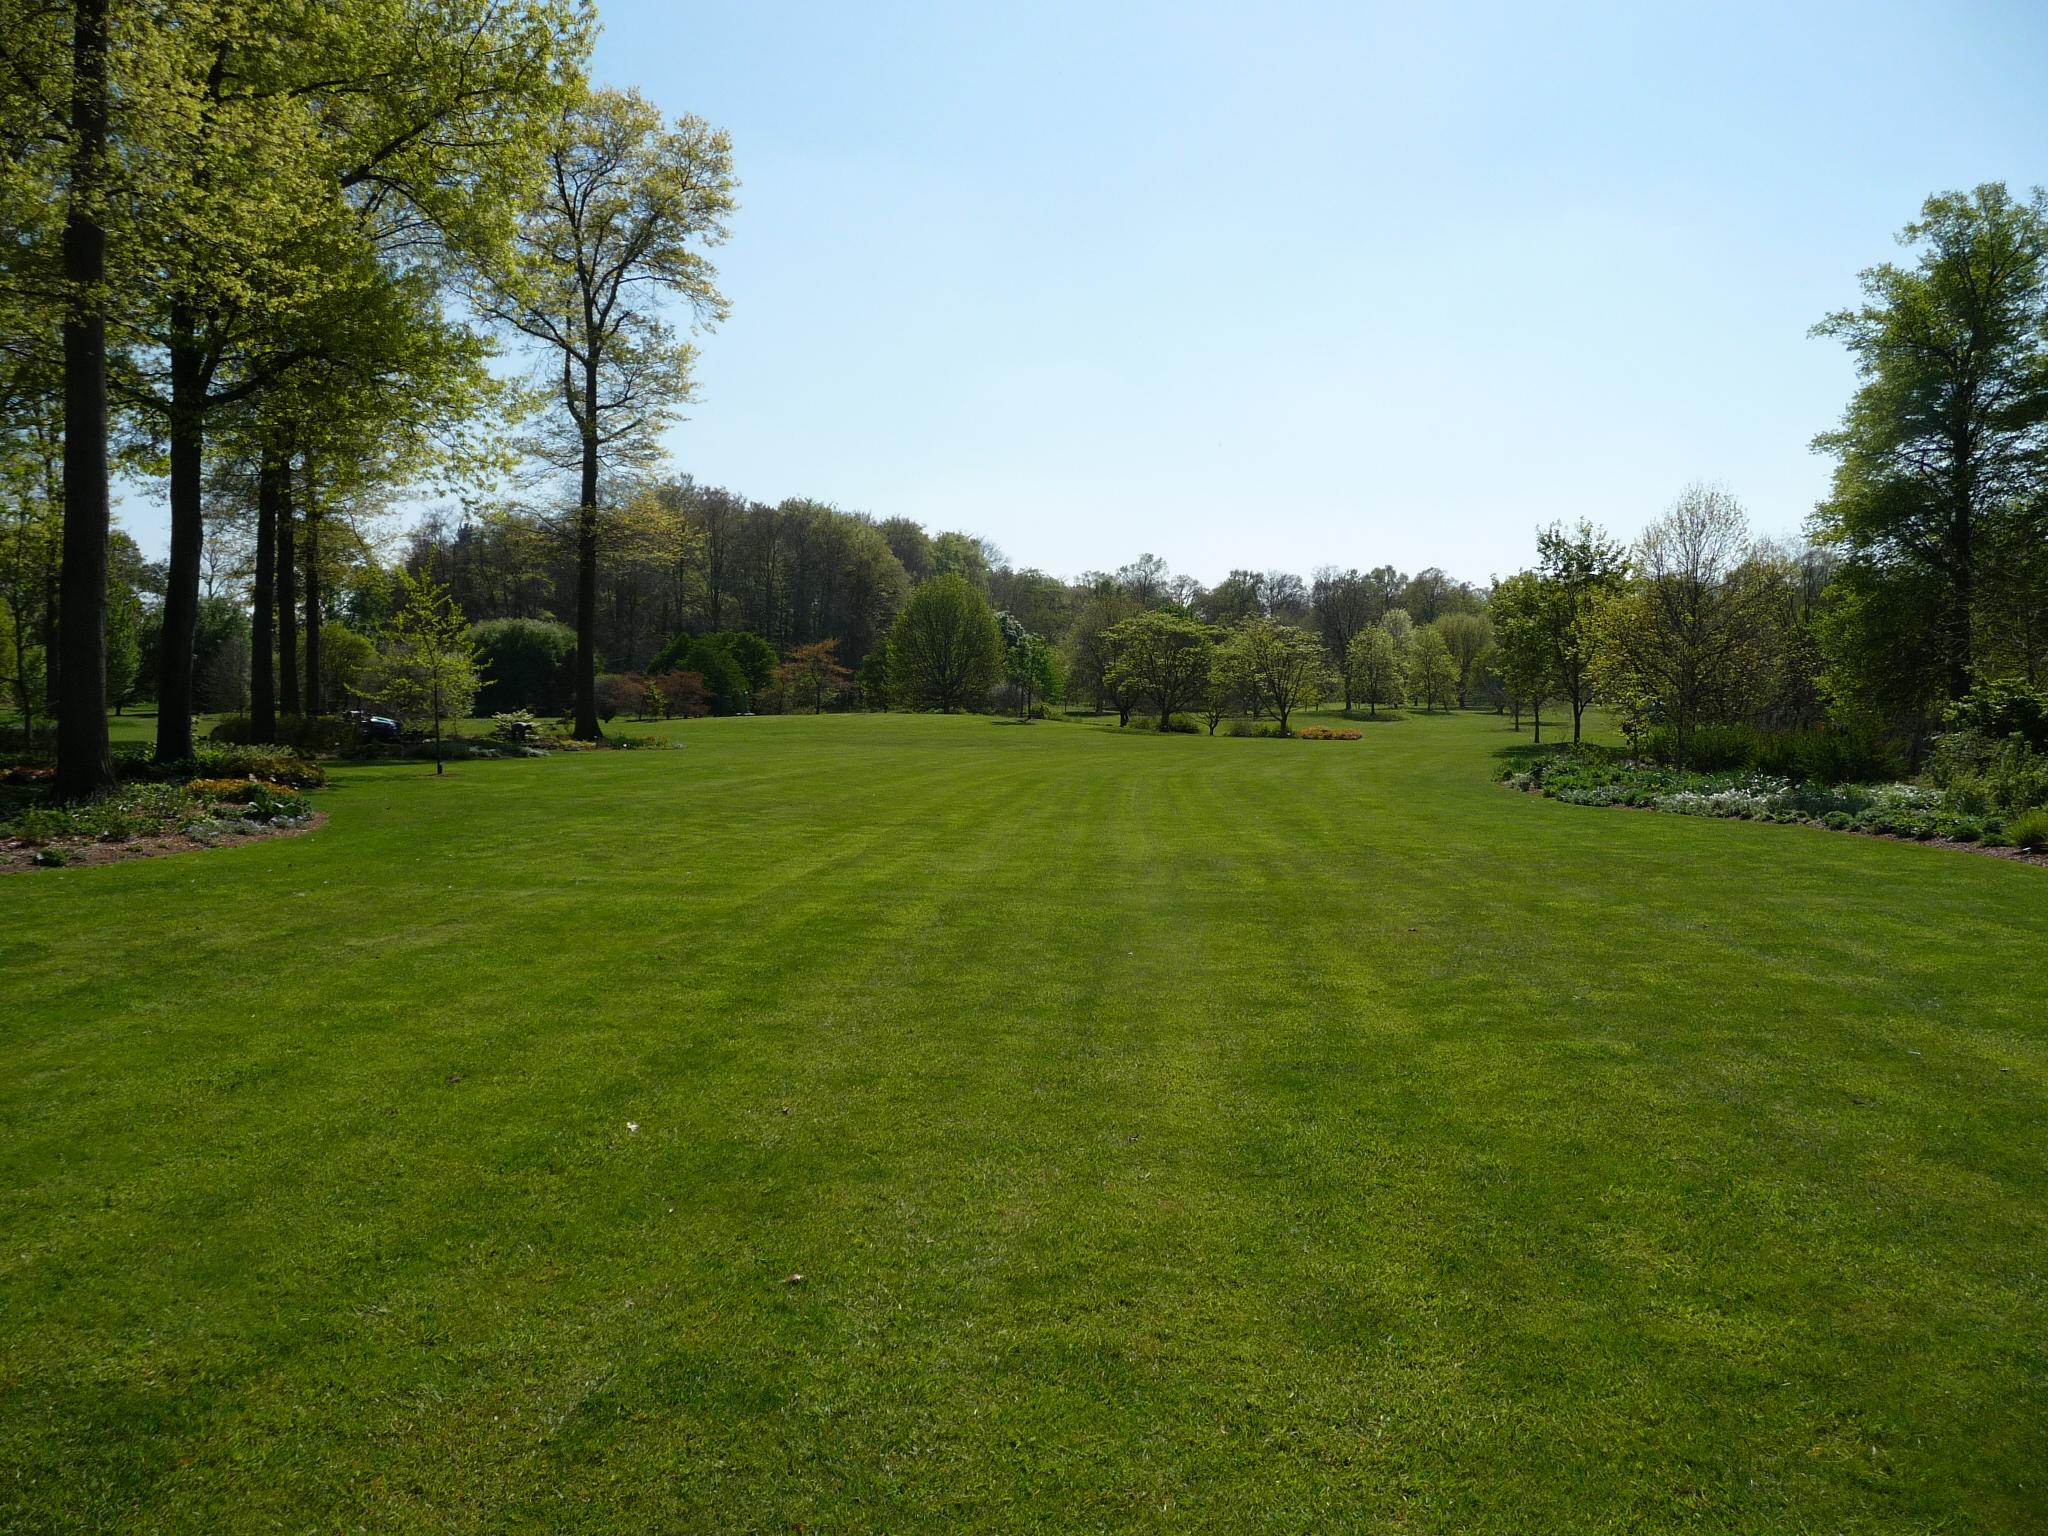 Wespelaar Arboretum